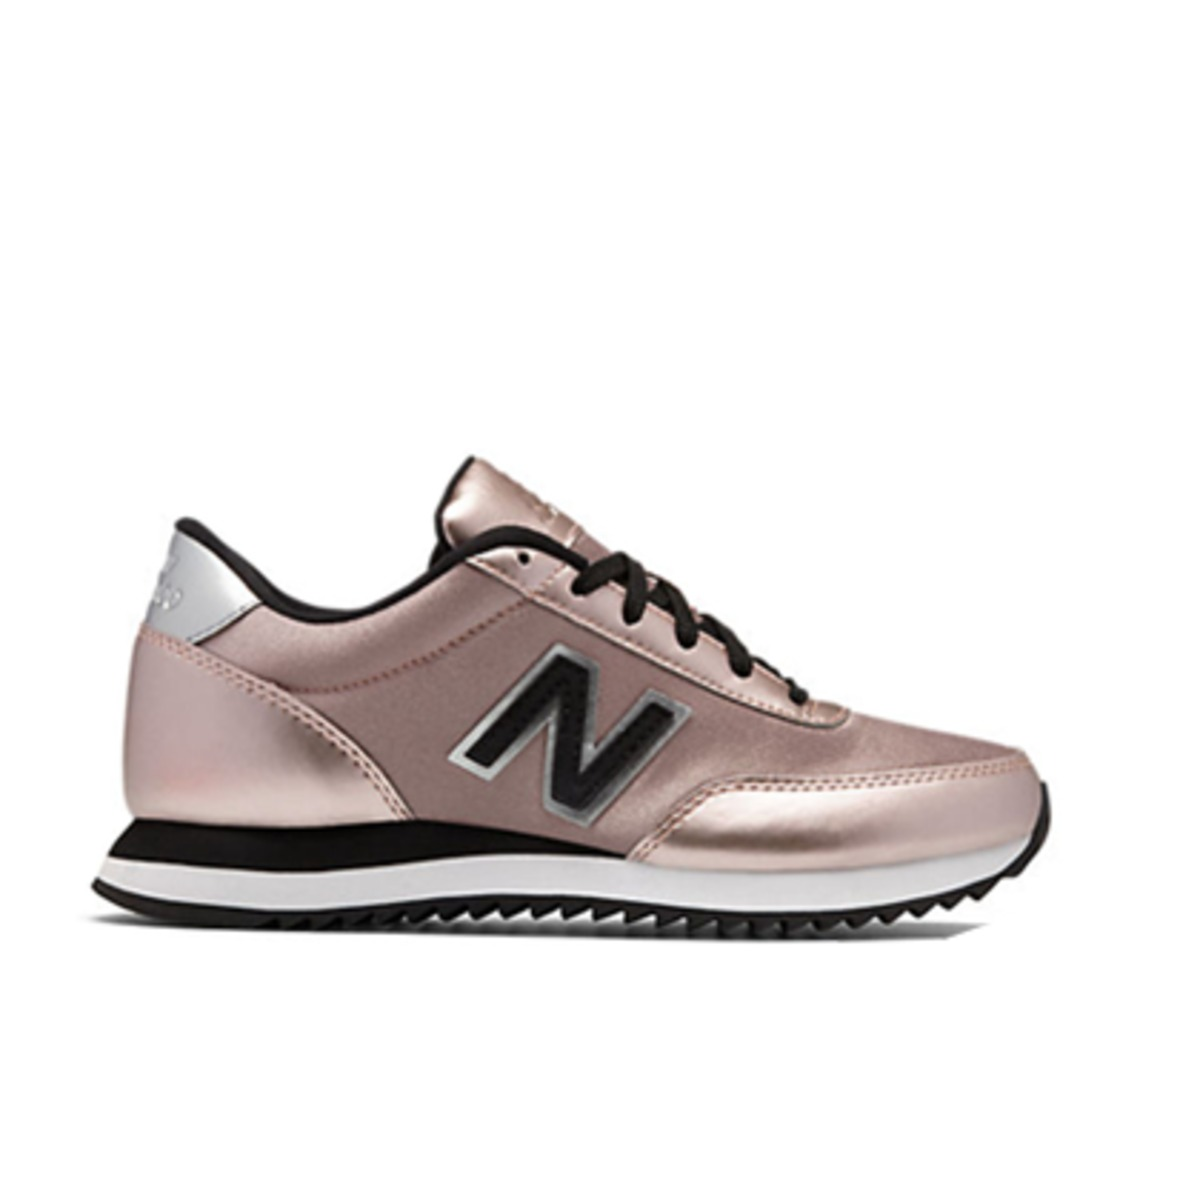 negro rosado new balance 595